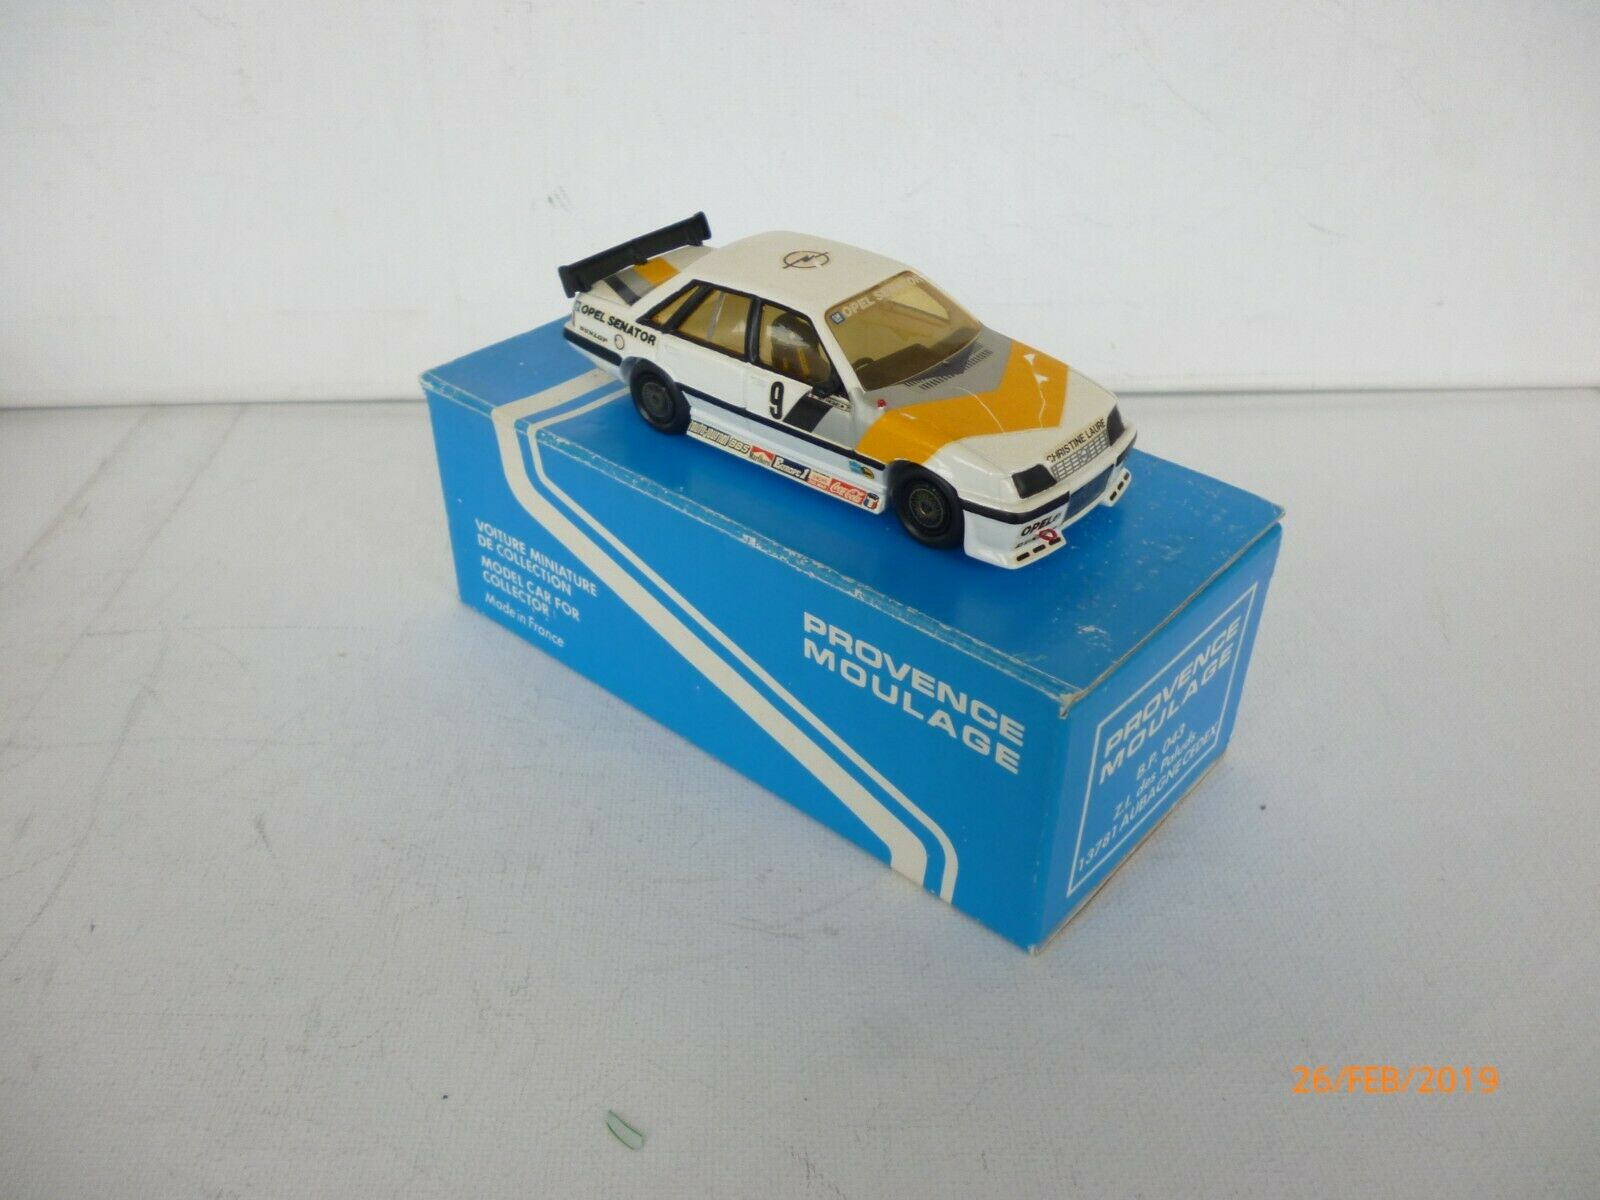 PROVENCE MOULAGE  KIT OPEL SENATOR PRODUCTION K-188 - 1 43 - IN BOX